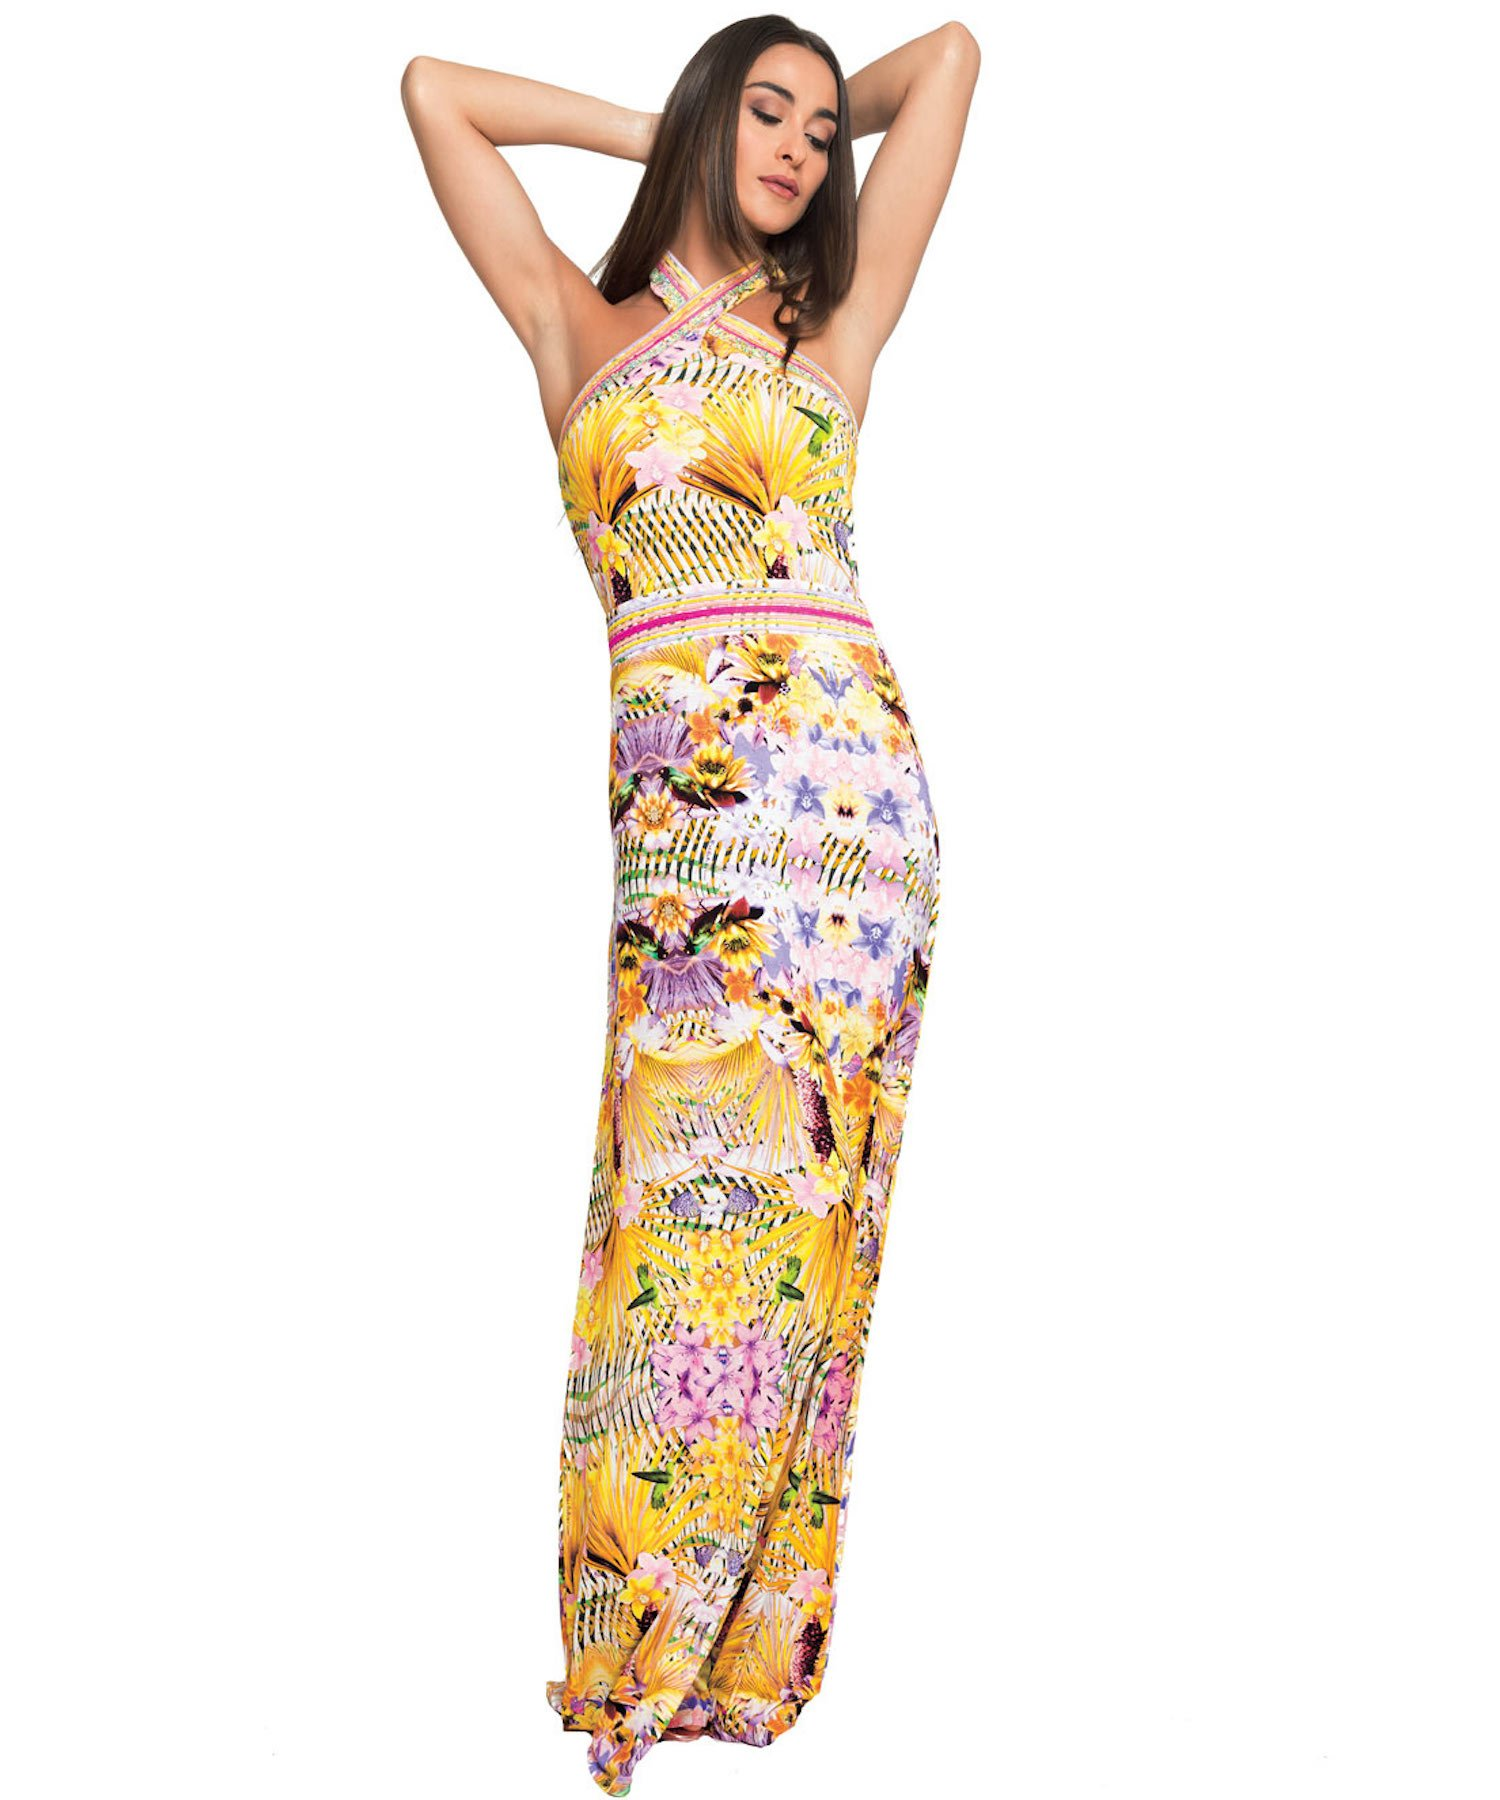 ZANZIBAR DRESS LONG DRESS RHINESTONES 3705 - Zanzibar Rosa